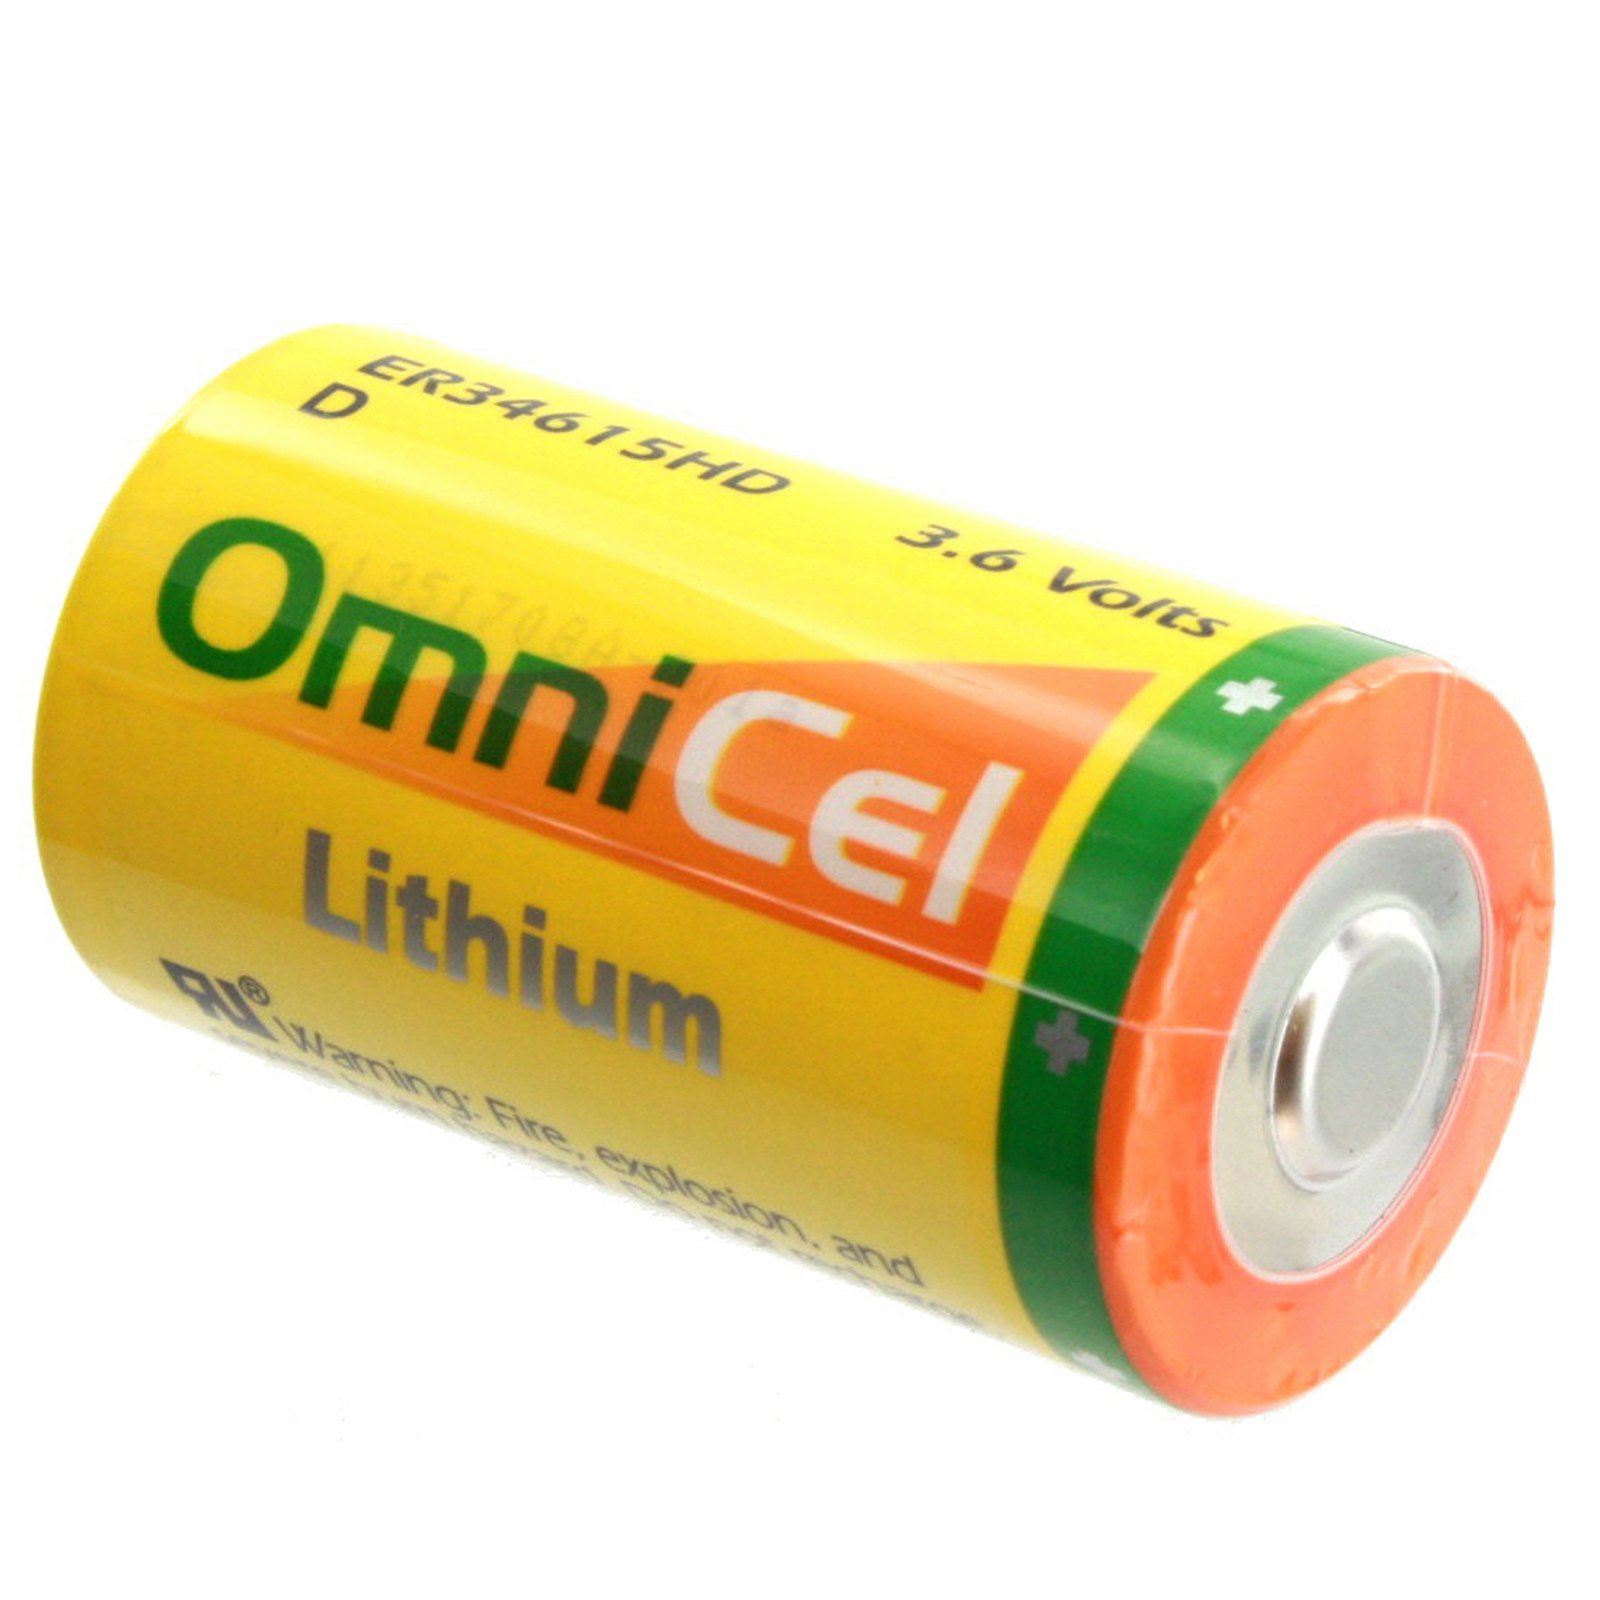 OmniCel ER34615HD 3.6V 13Ah Size D Lithium Standard Terminal Replaces Eagle Pitcher PT-2300, Saft LS-33600 LS33600C LSH20, Tadiran TL-2300 TL-4930 TL-5930, Tekcell SB-D01 SB-D02, Xeno XL-200F XL-205F by Exell Battery